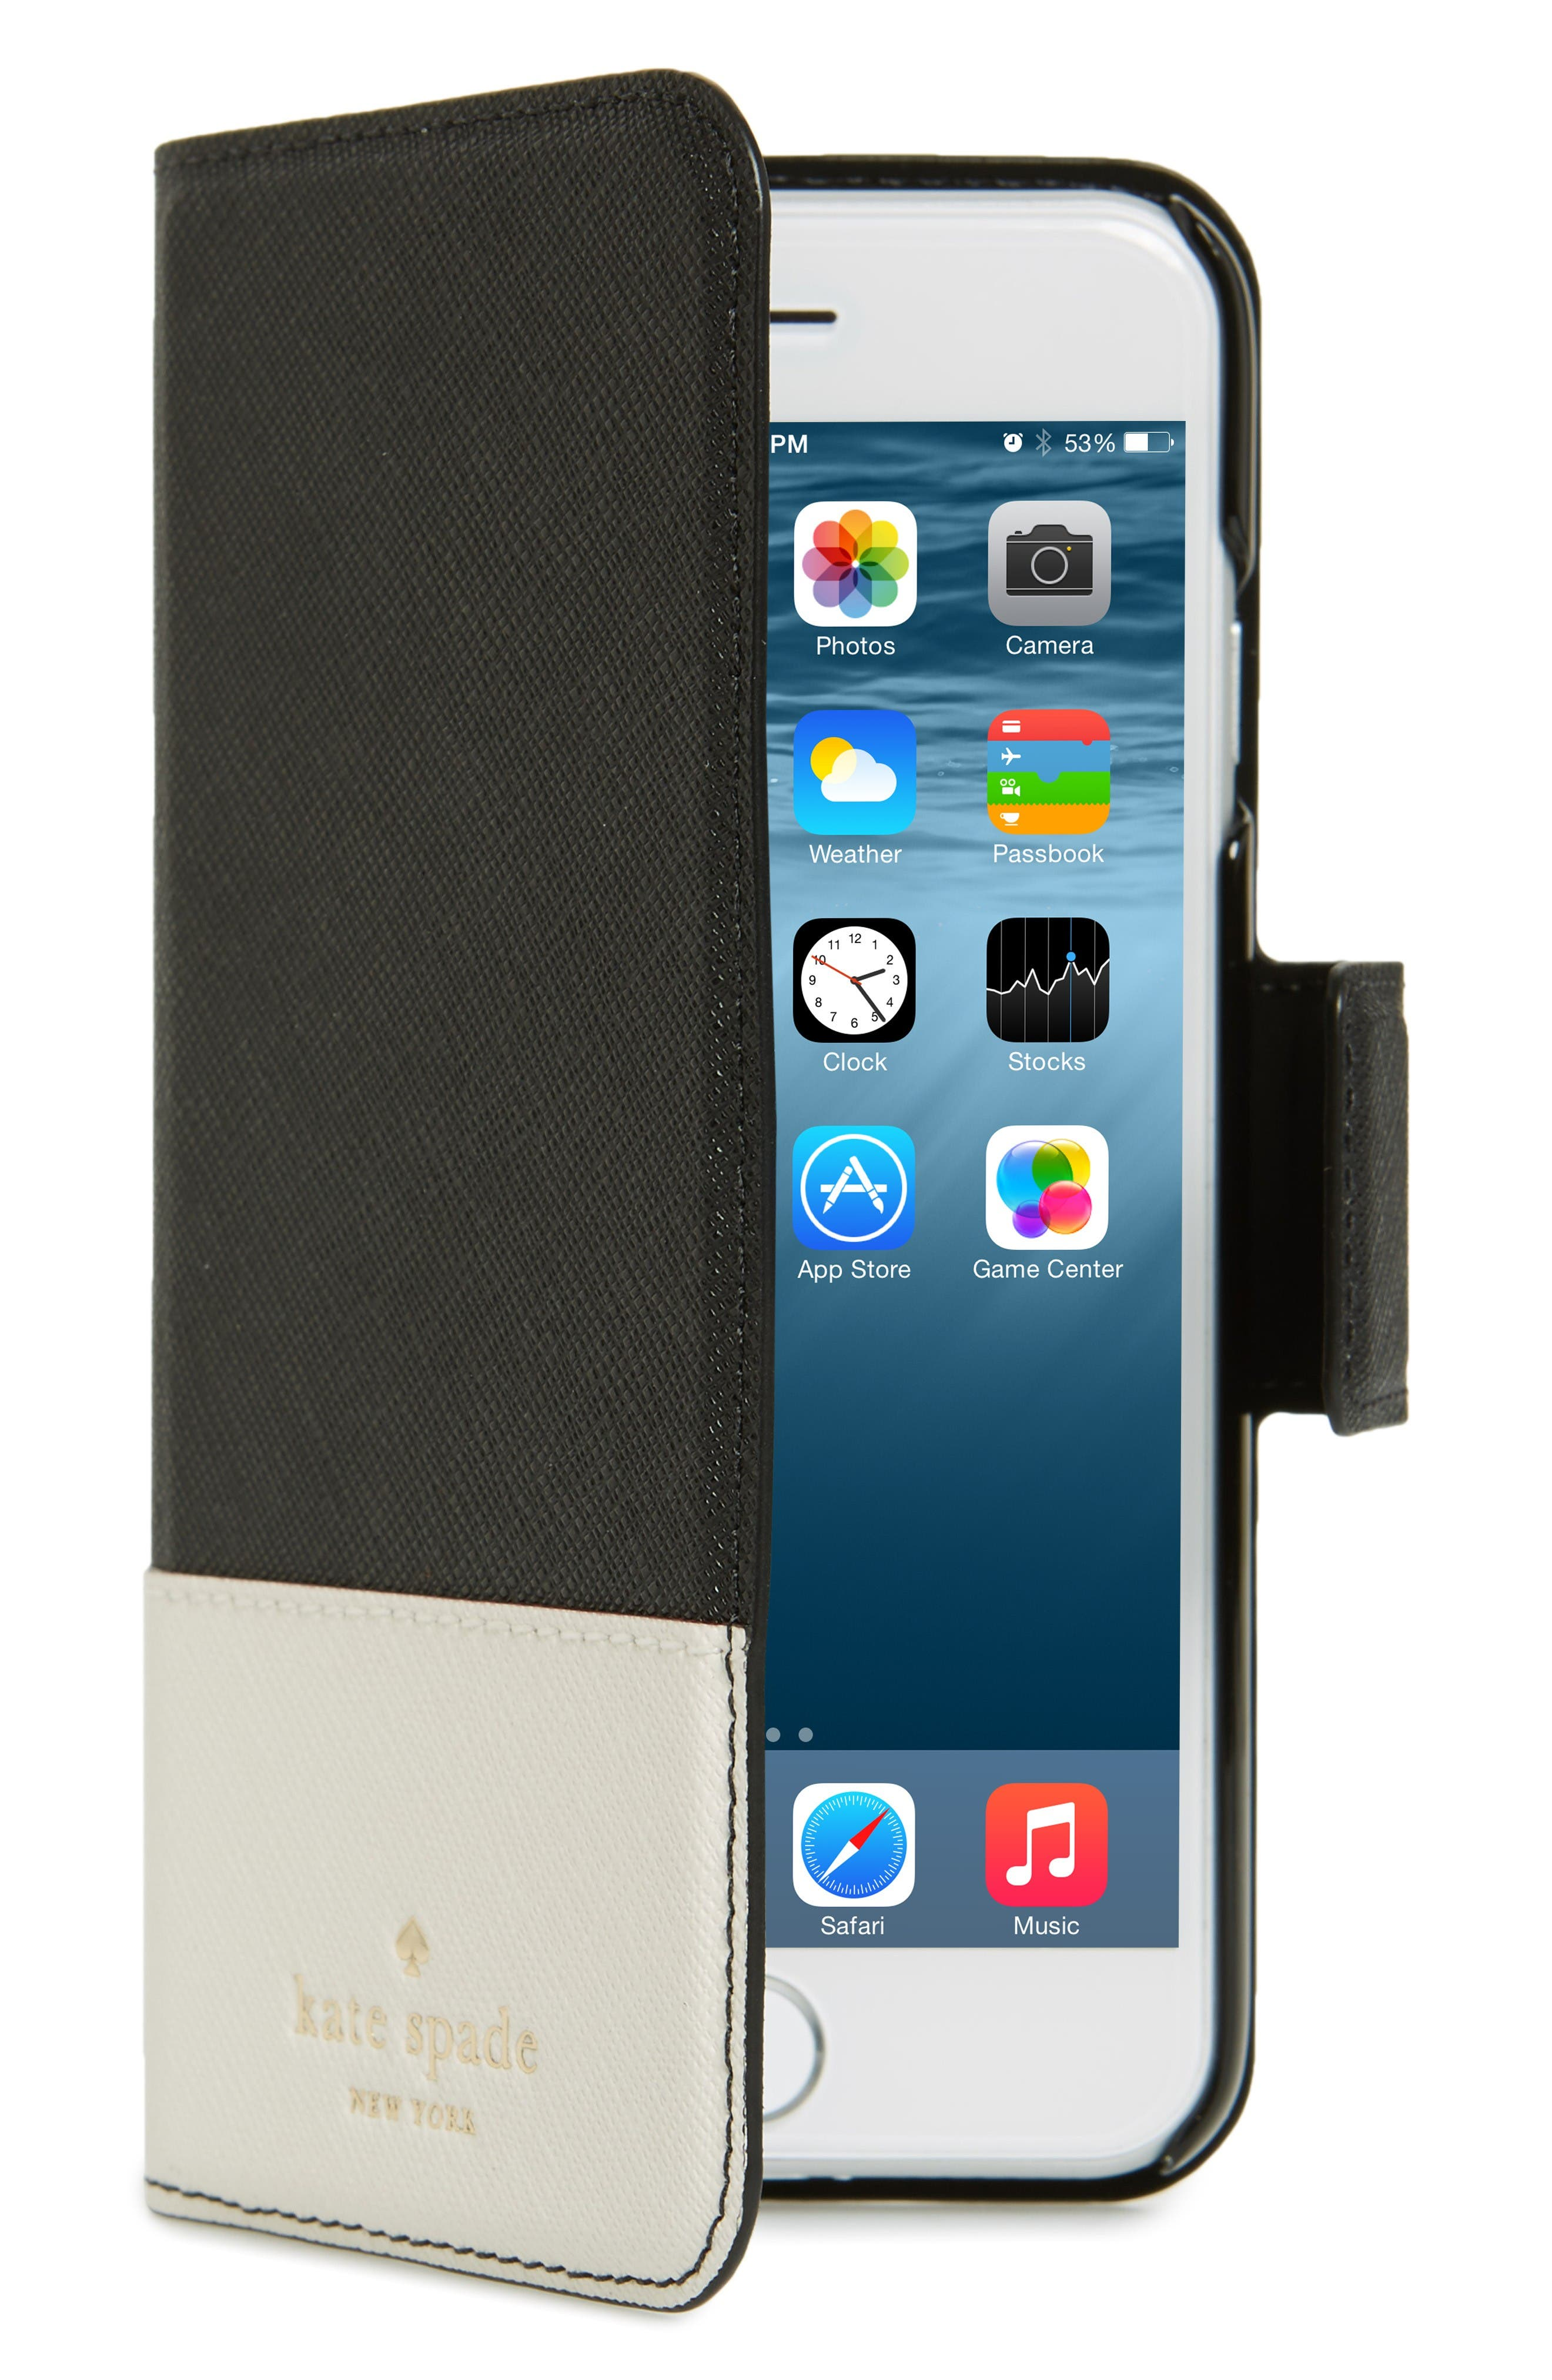 kate spade new york cedar street iPhone 7 & 7 Plus folio case